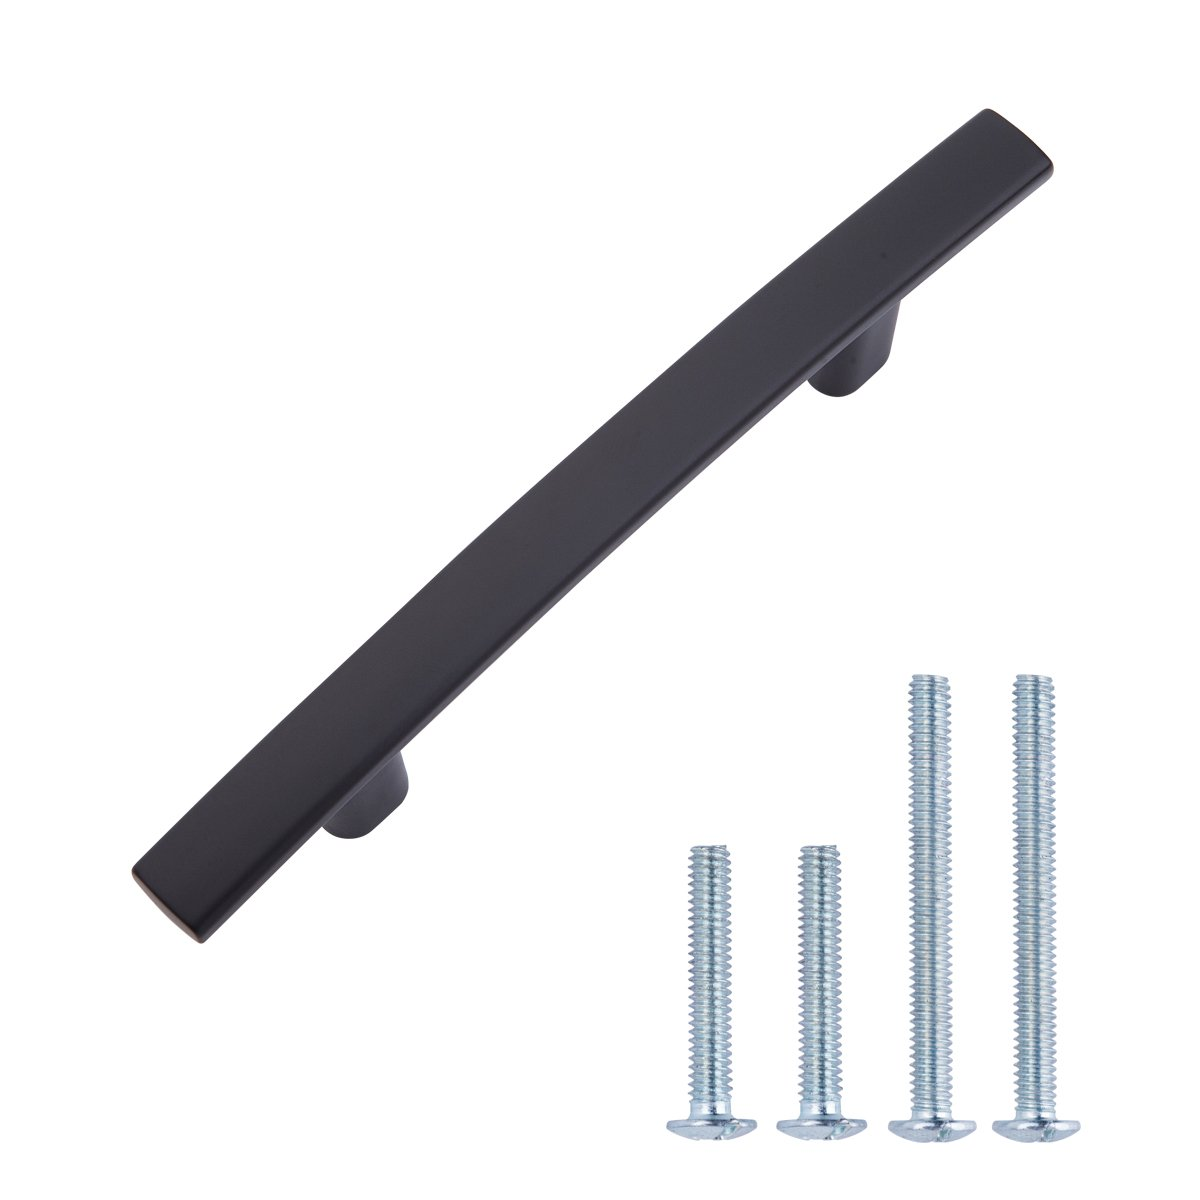 "AmazonBasics Modern Curved Cabinet Handle, 5.25"" Length (3"" Hole Center), Flat Black, 10-Pack"